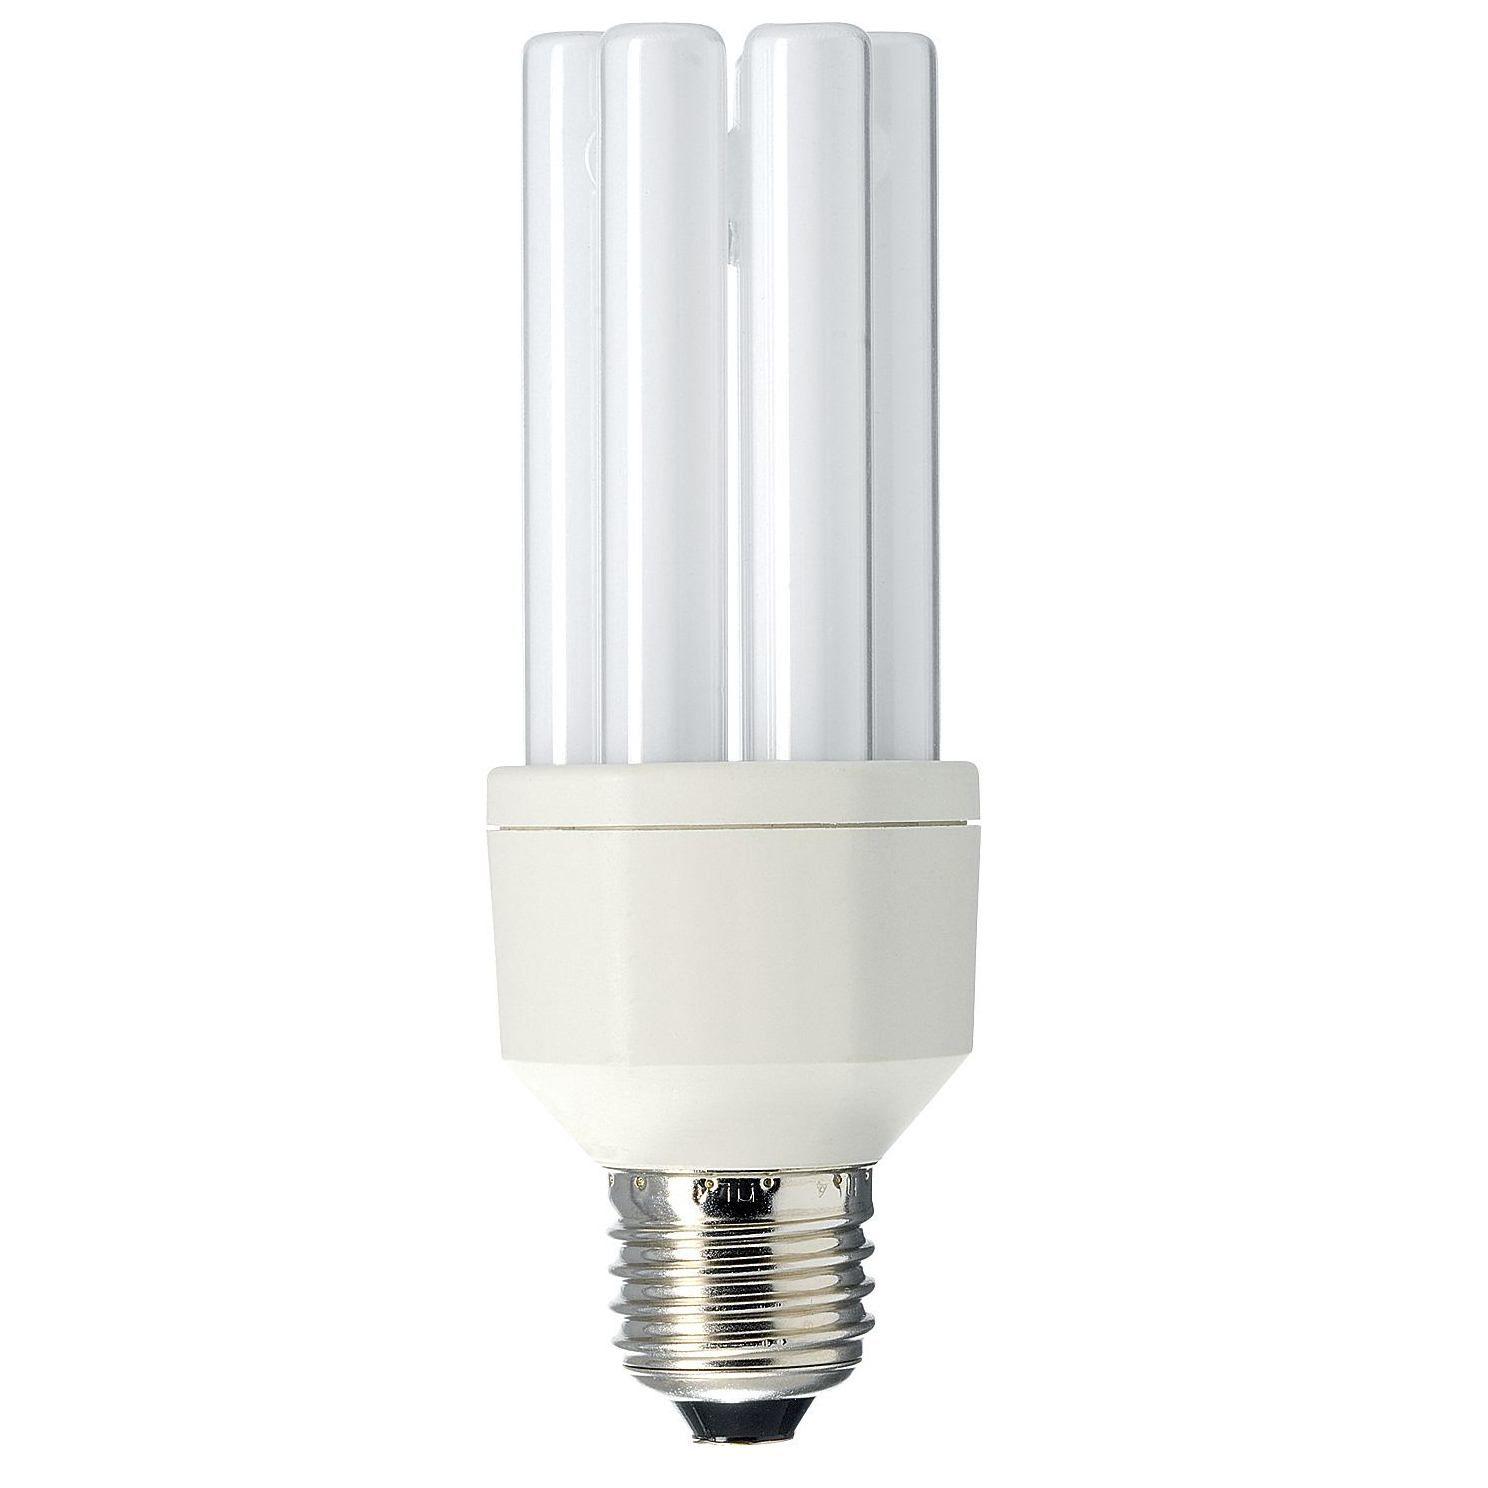 Купить Лампа люминесцентная Philips Master PLE-R 20W/865 E27 220-240V 1CT/6